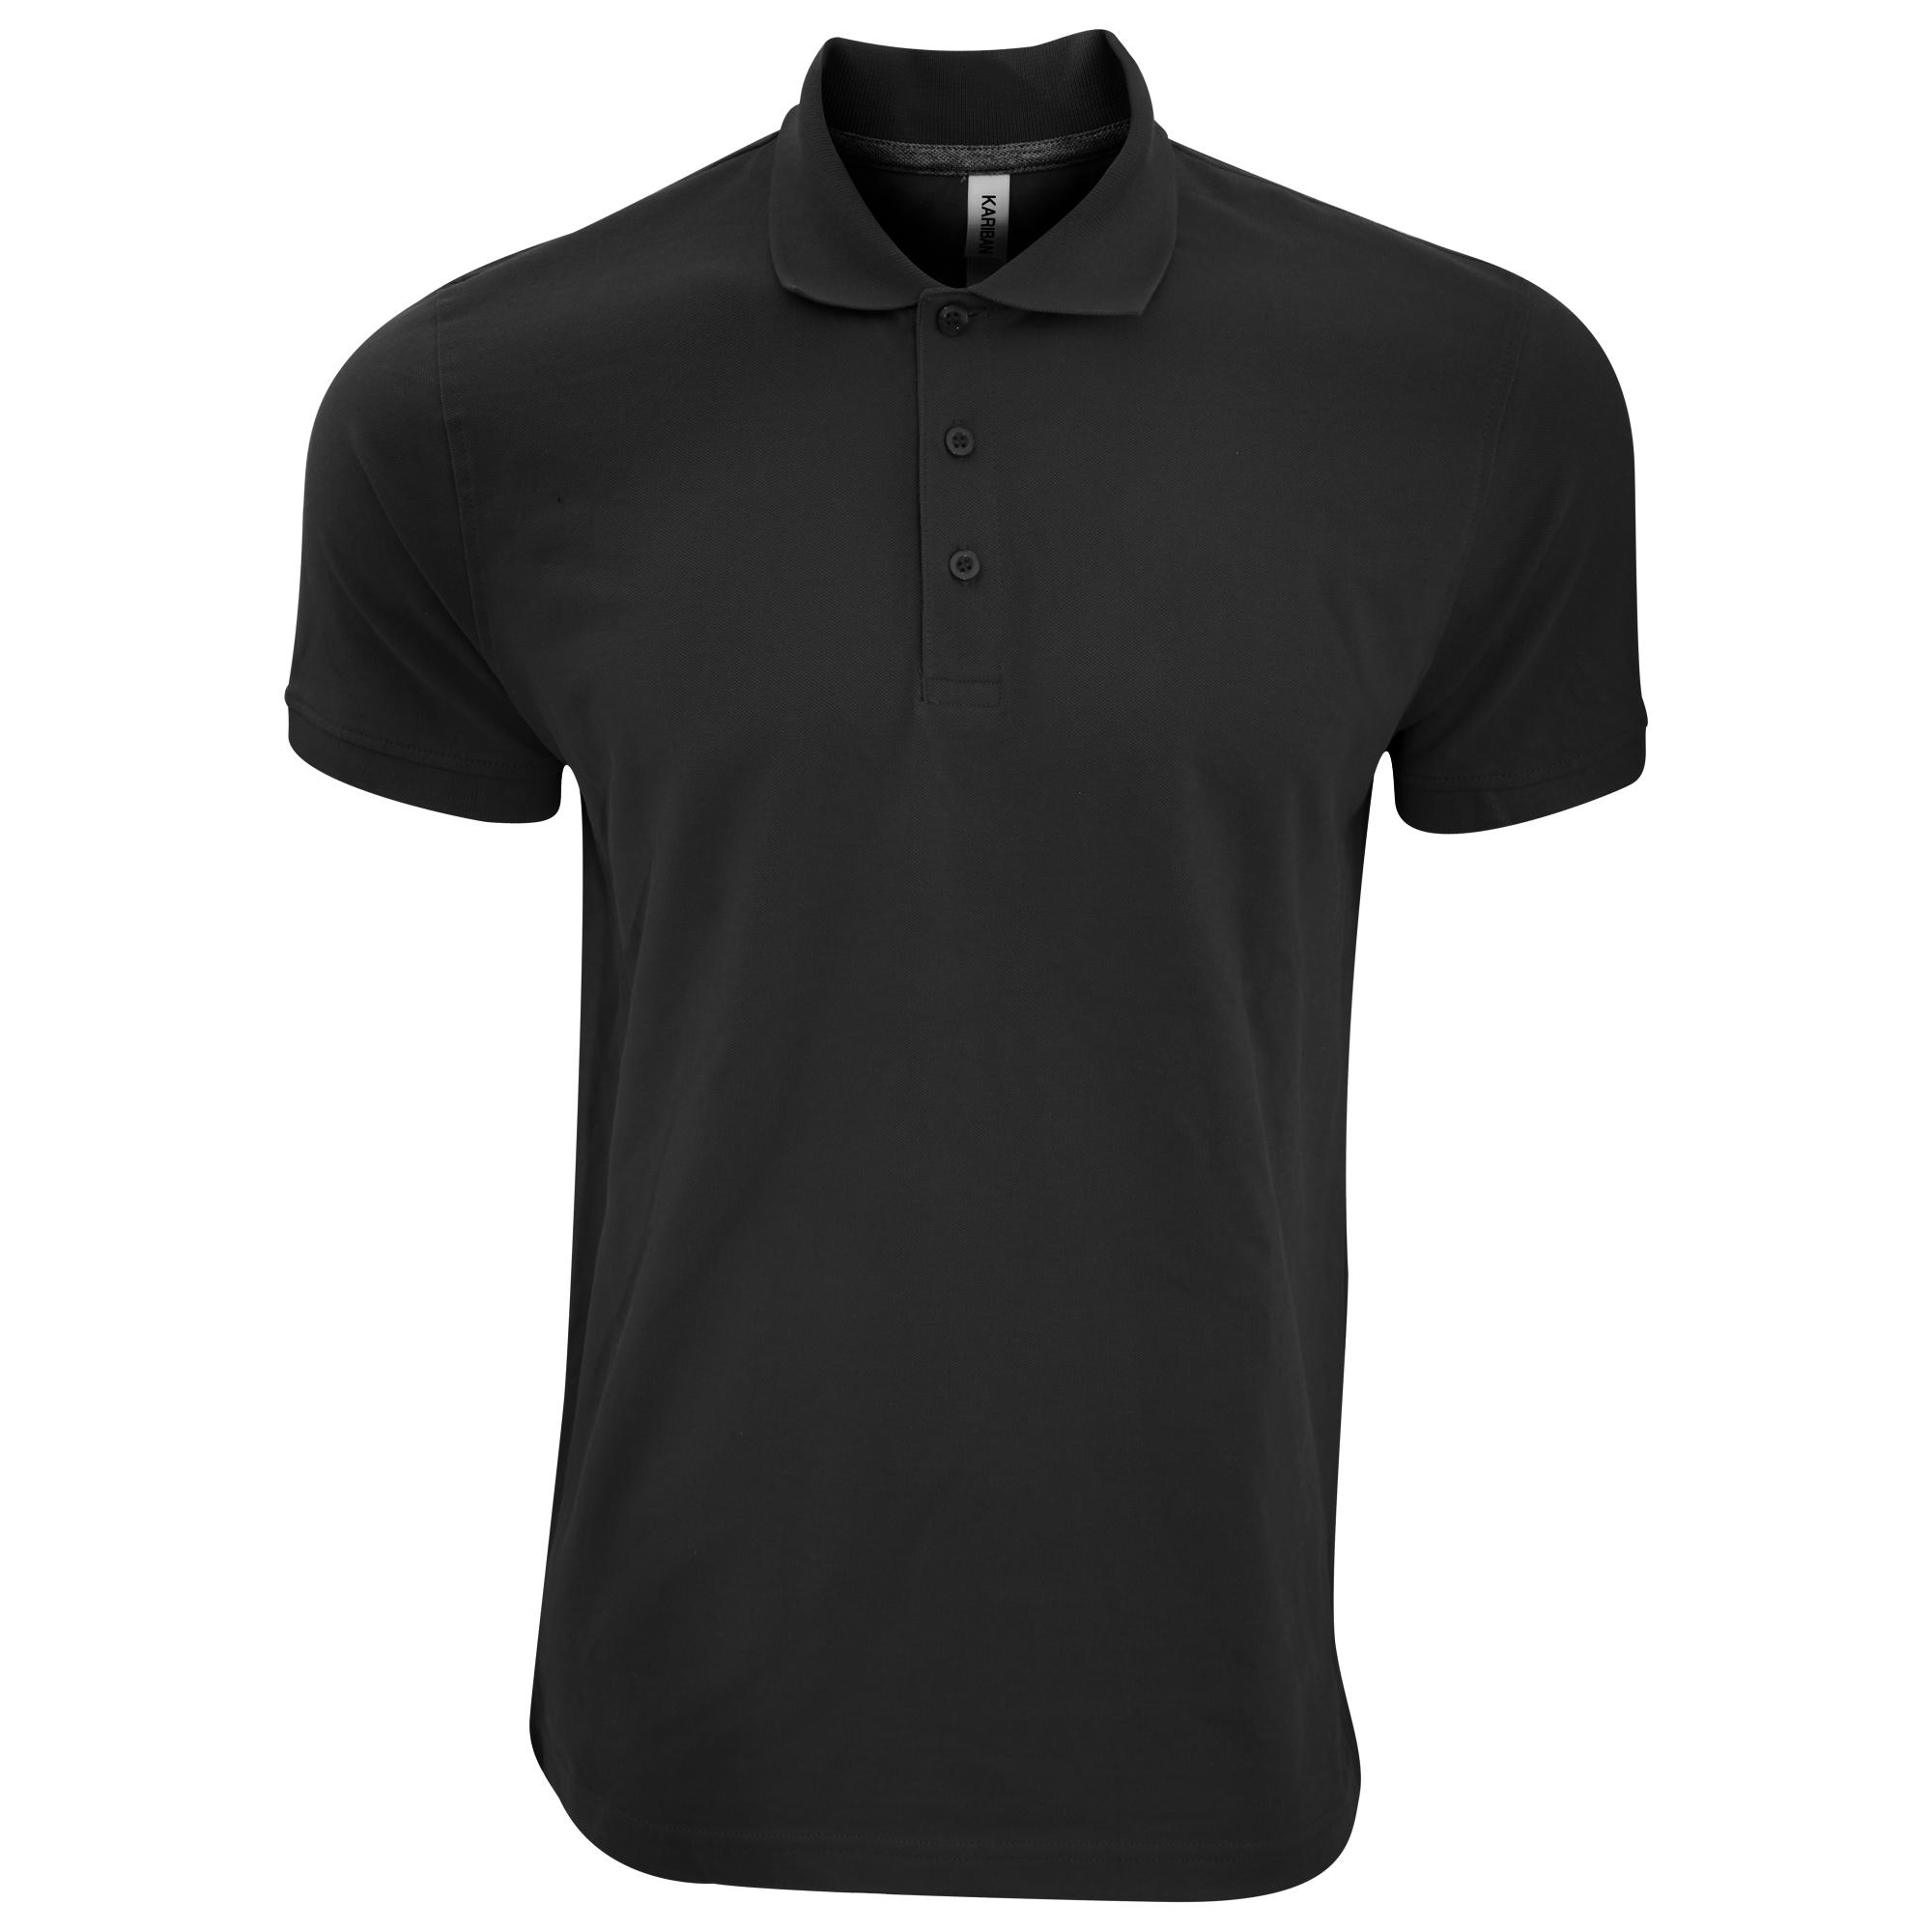 Kariban-Mens-Short-Sleeve-Cotton-Pique-Polo-Shirt-PC2535